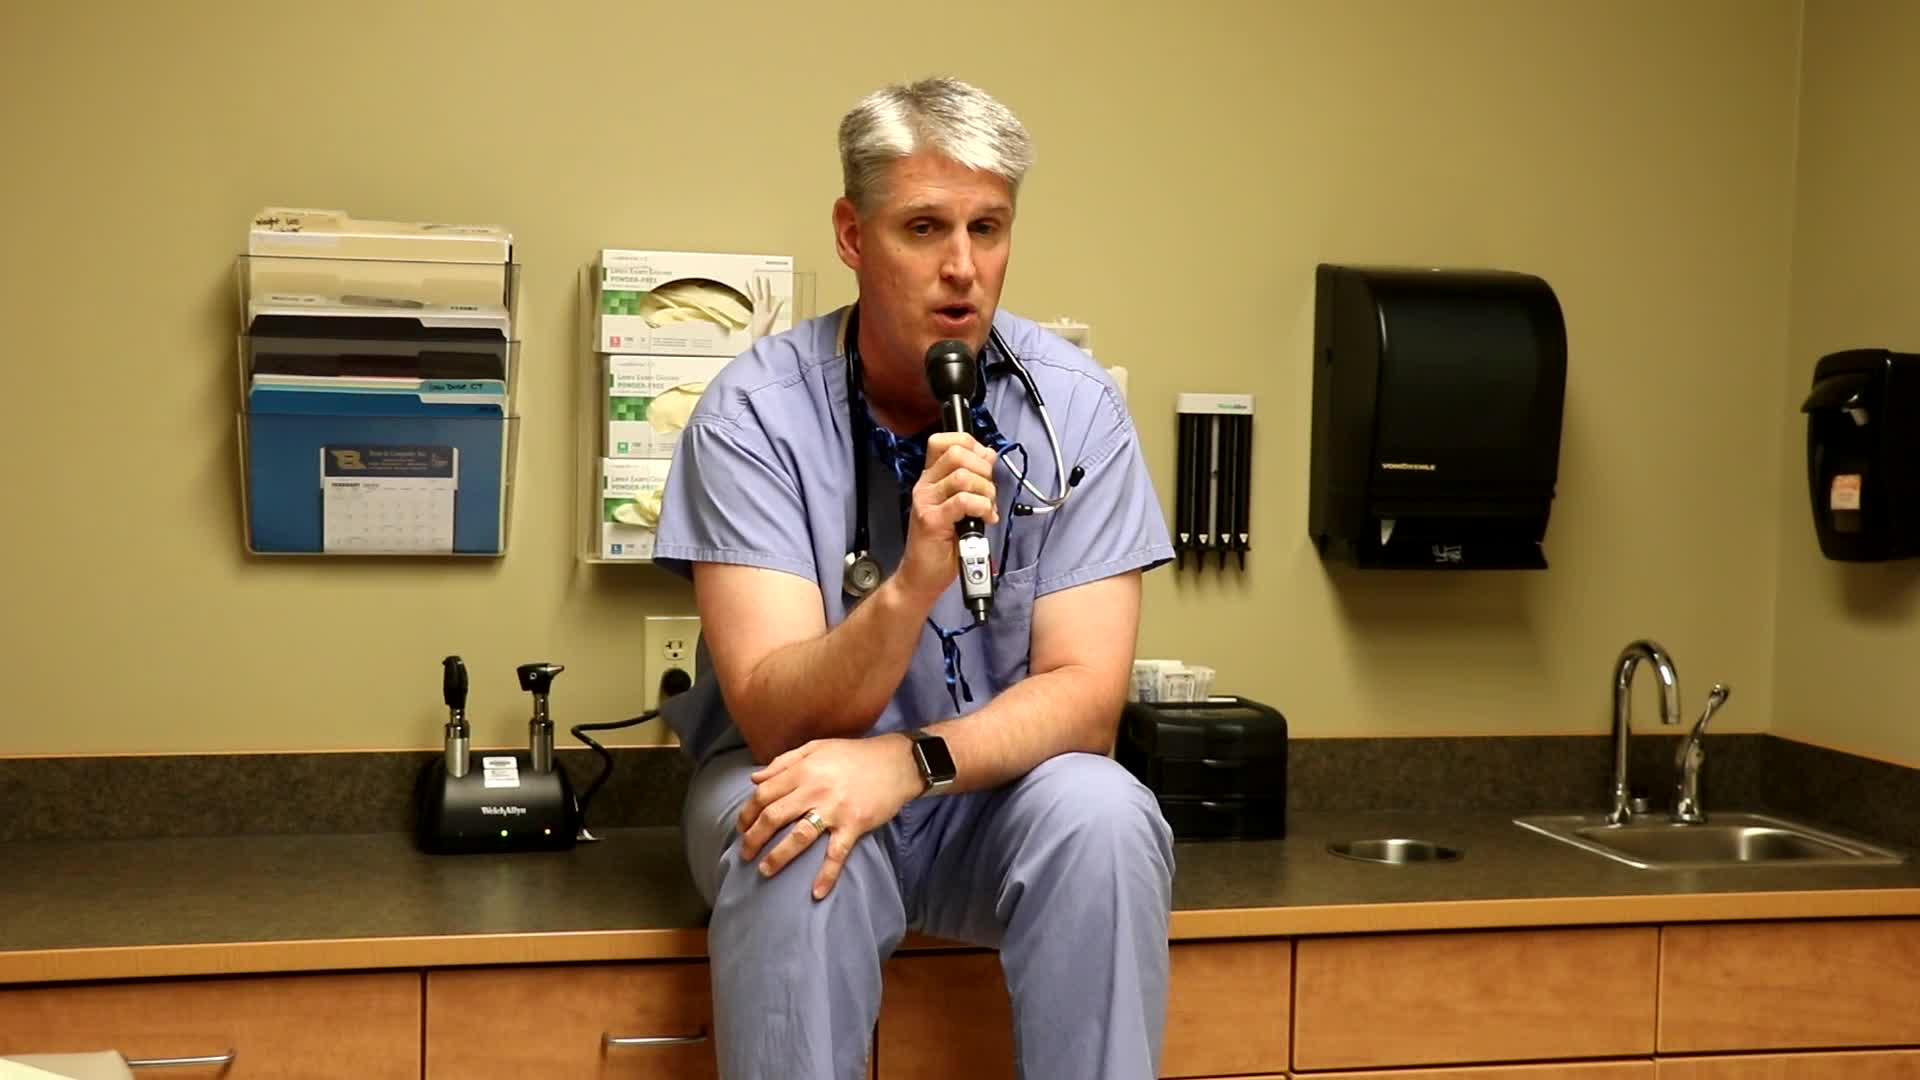 Show & Shel - Dr. Scheufler COVID update